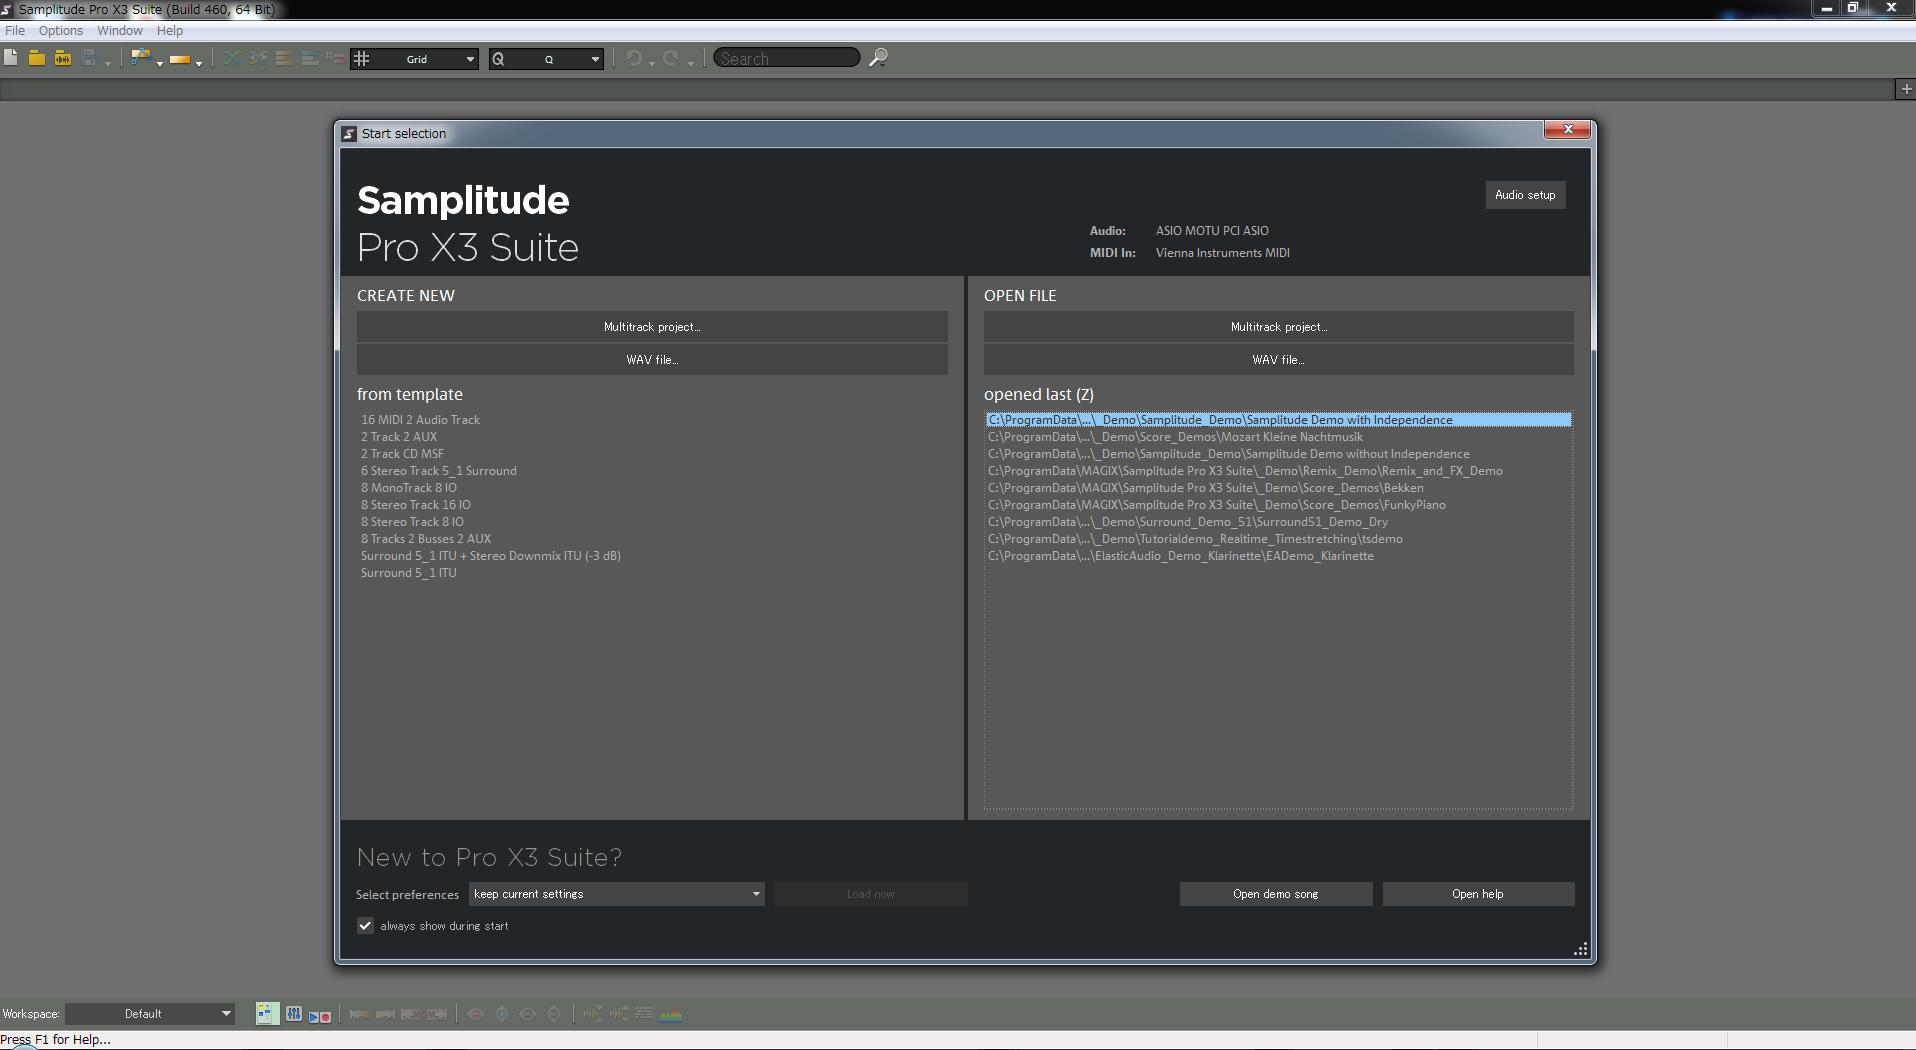 Samplitude Pro X3 Suite|購入 画像